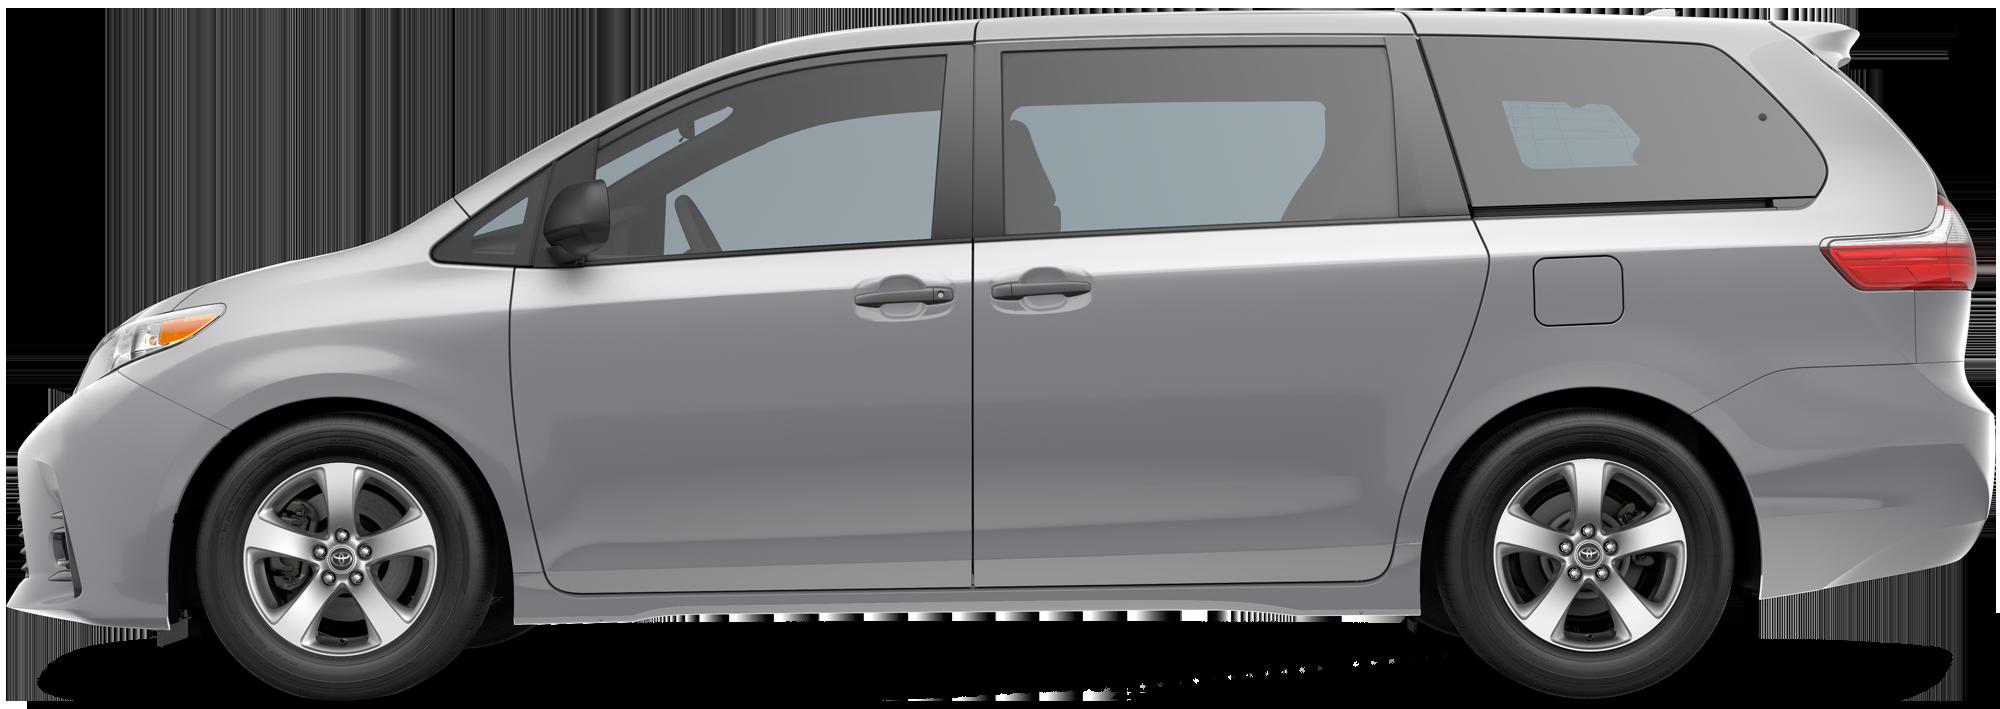 2020 Toyota Sienna Furgoneta L 7 Passenger